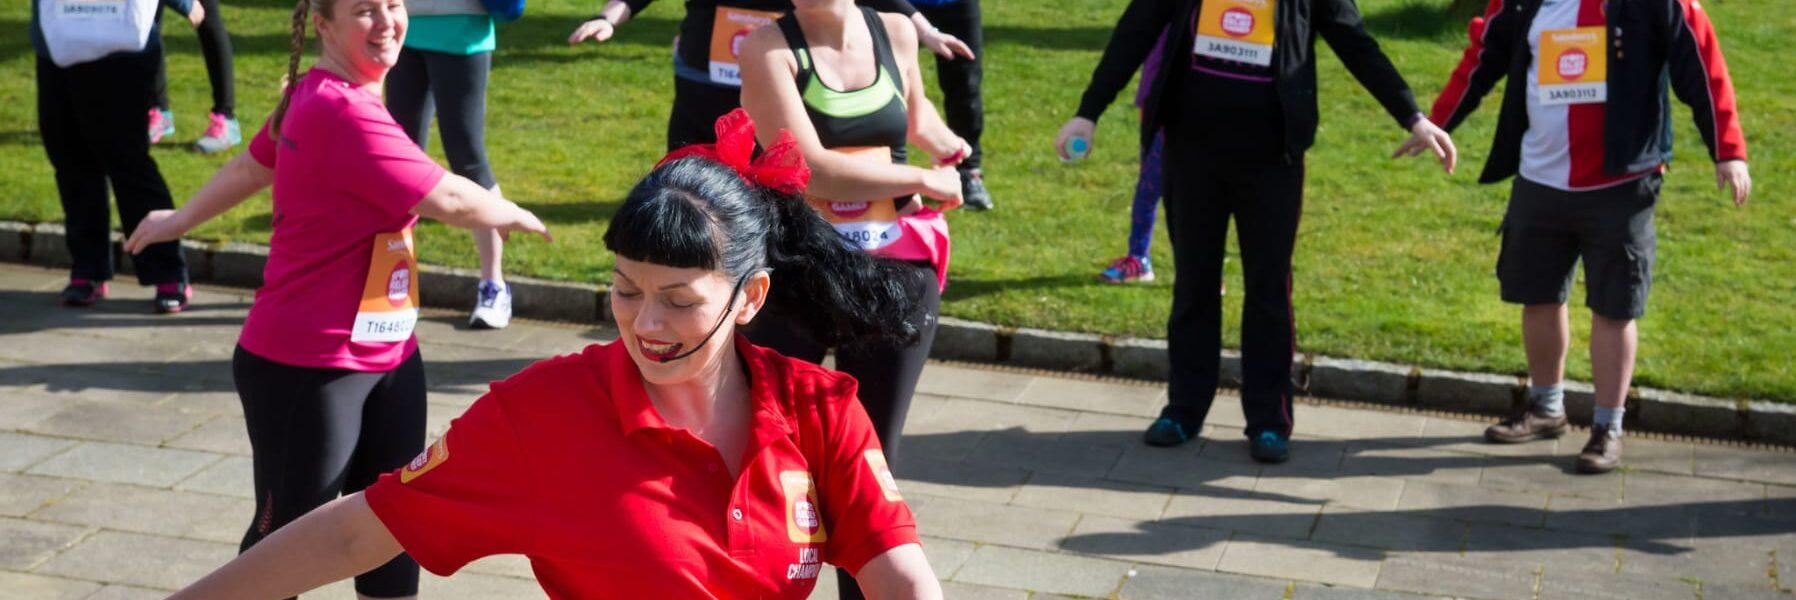 A fitness instructor leads an outdoors aerobics class